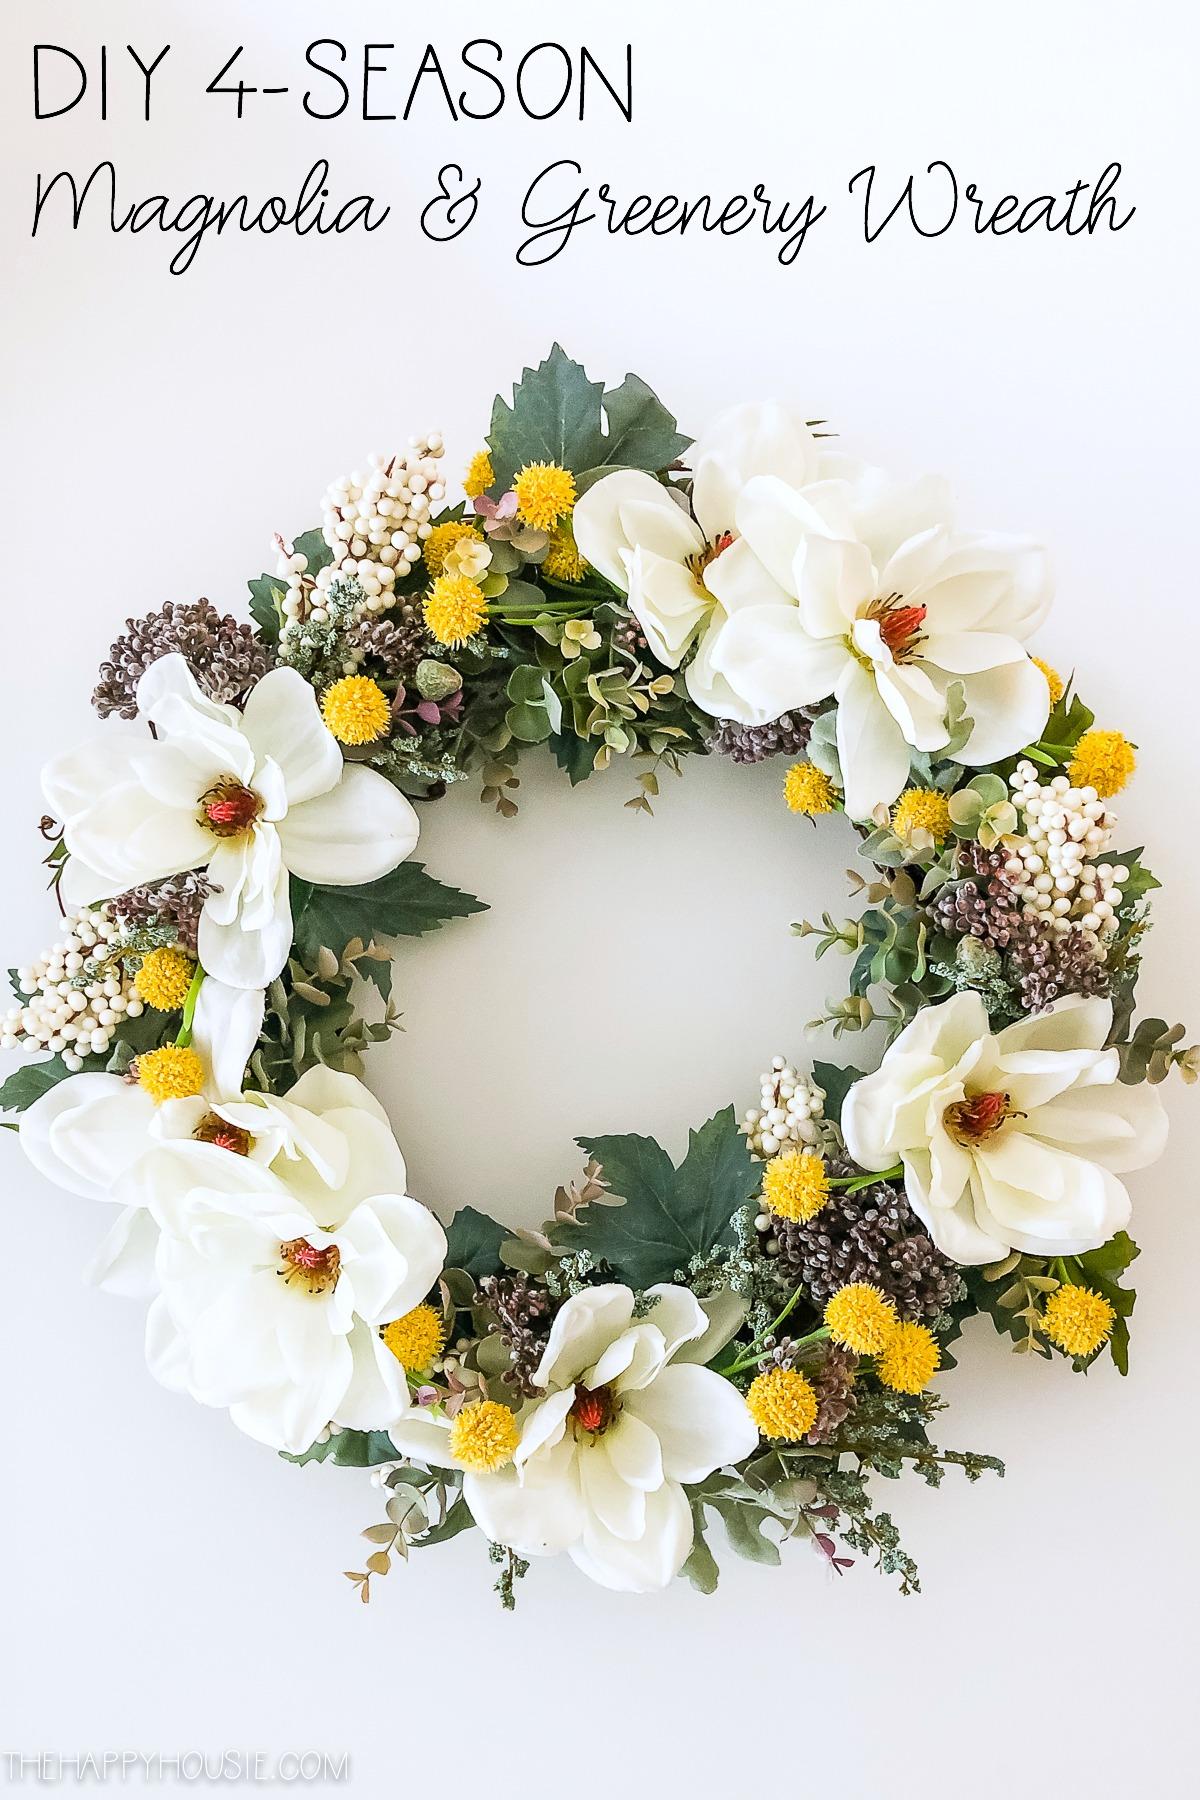 DIY 4 season magnolia and greenery wreath poster.